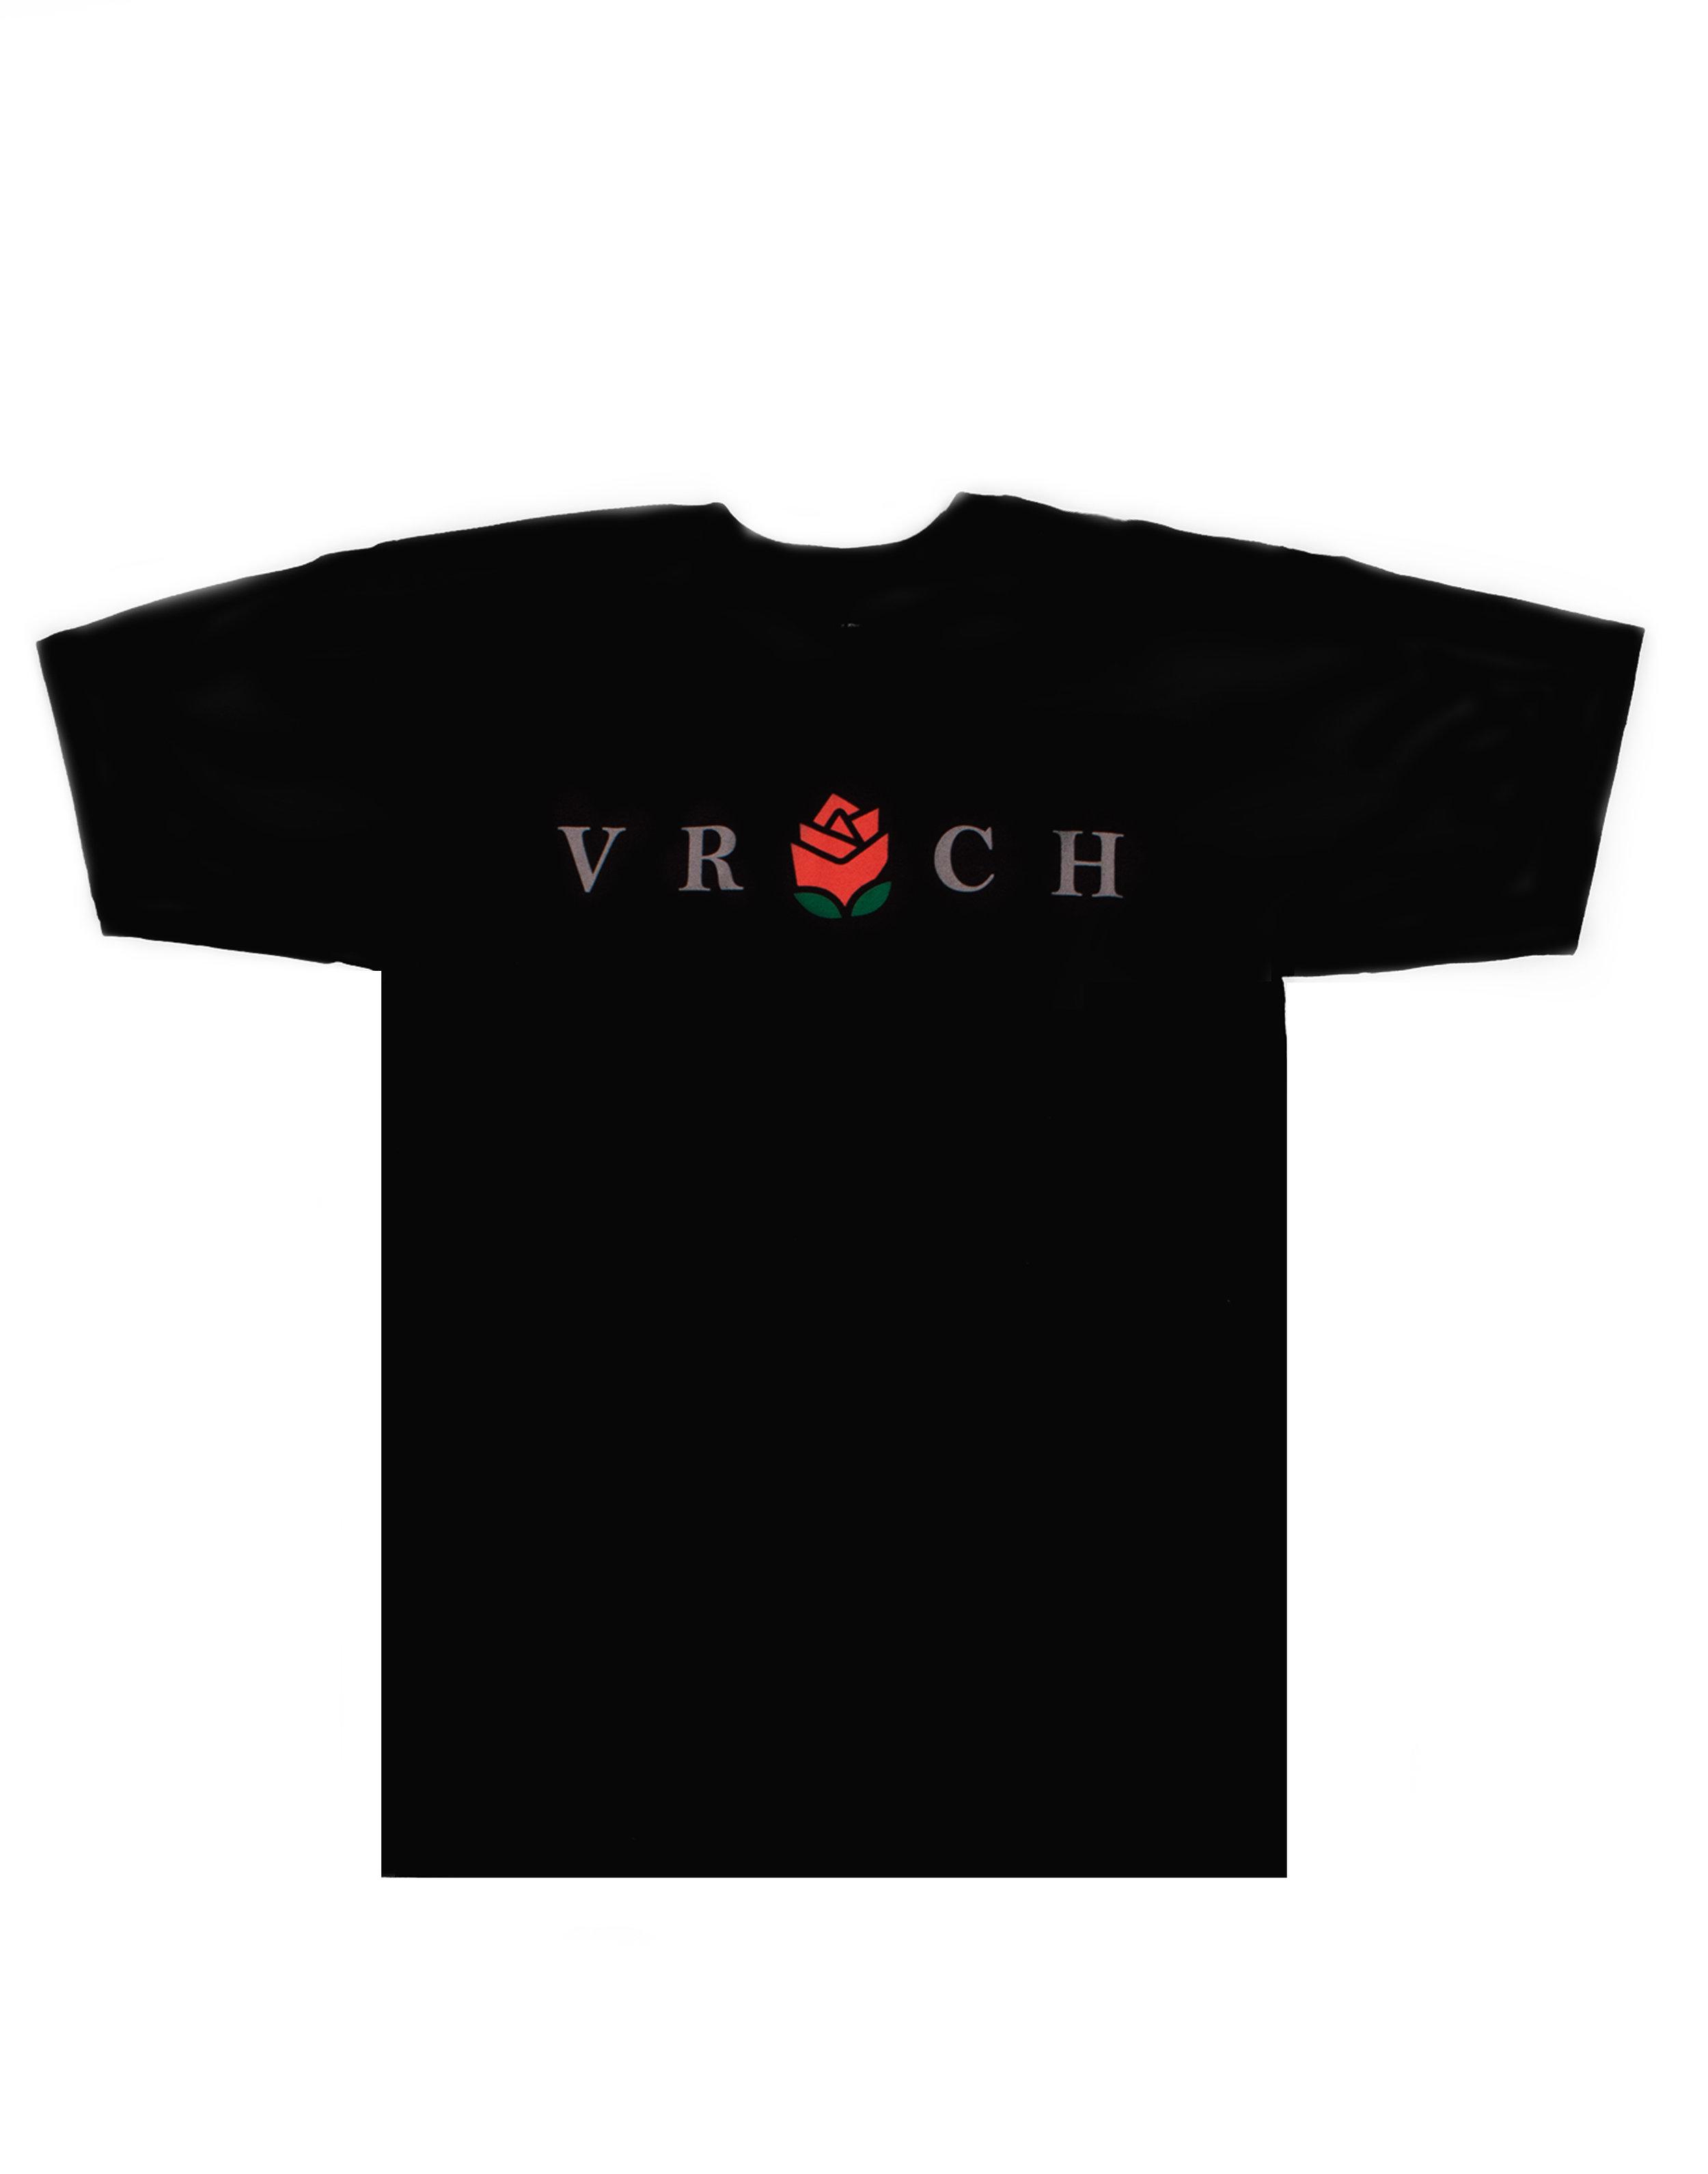 varche10.jpg